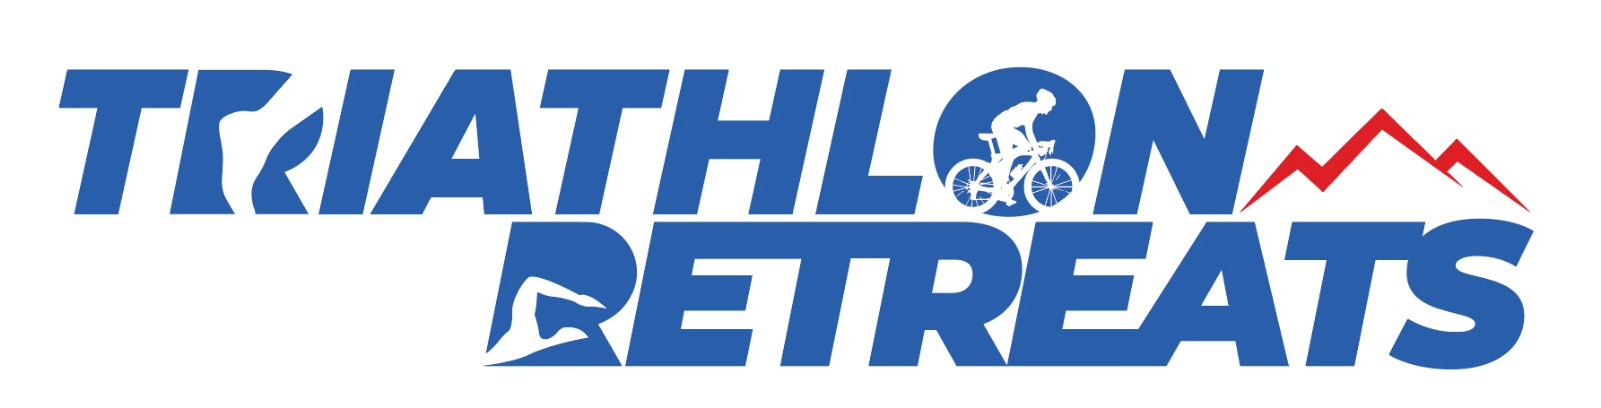 Triathlon Retreats - Triathlon Training Camps & Triathlon Meet Ups